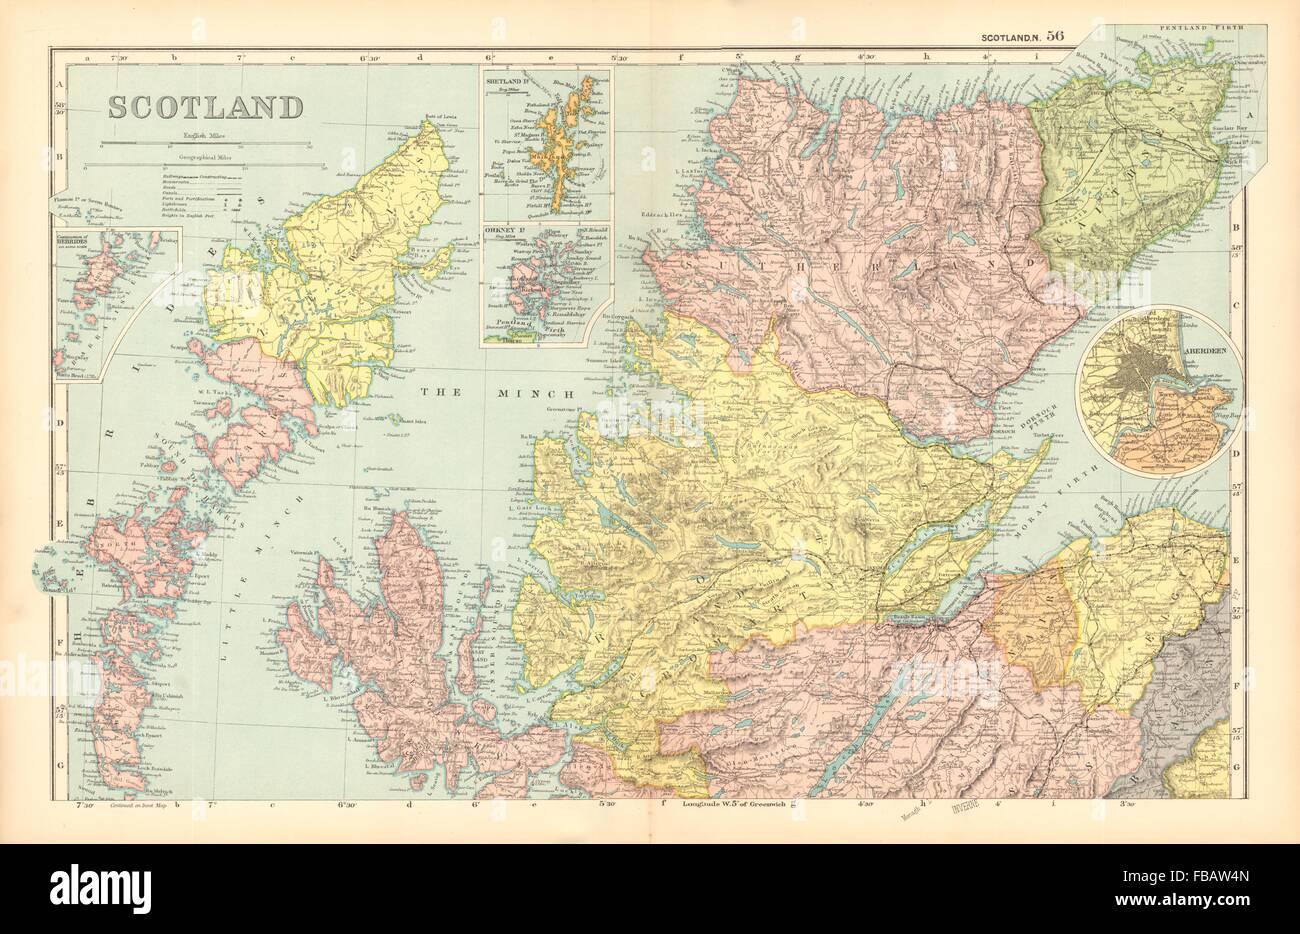 Schottland Karte Highlands.Schottland Highlands Inseln Parlamentarische Abteilungen Bezirke